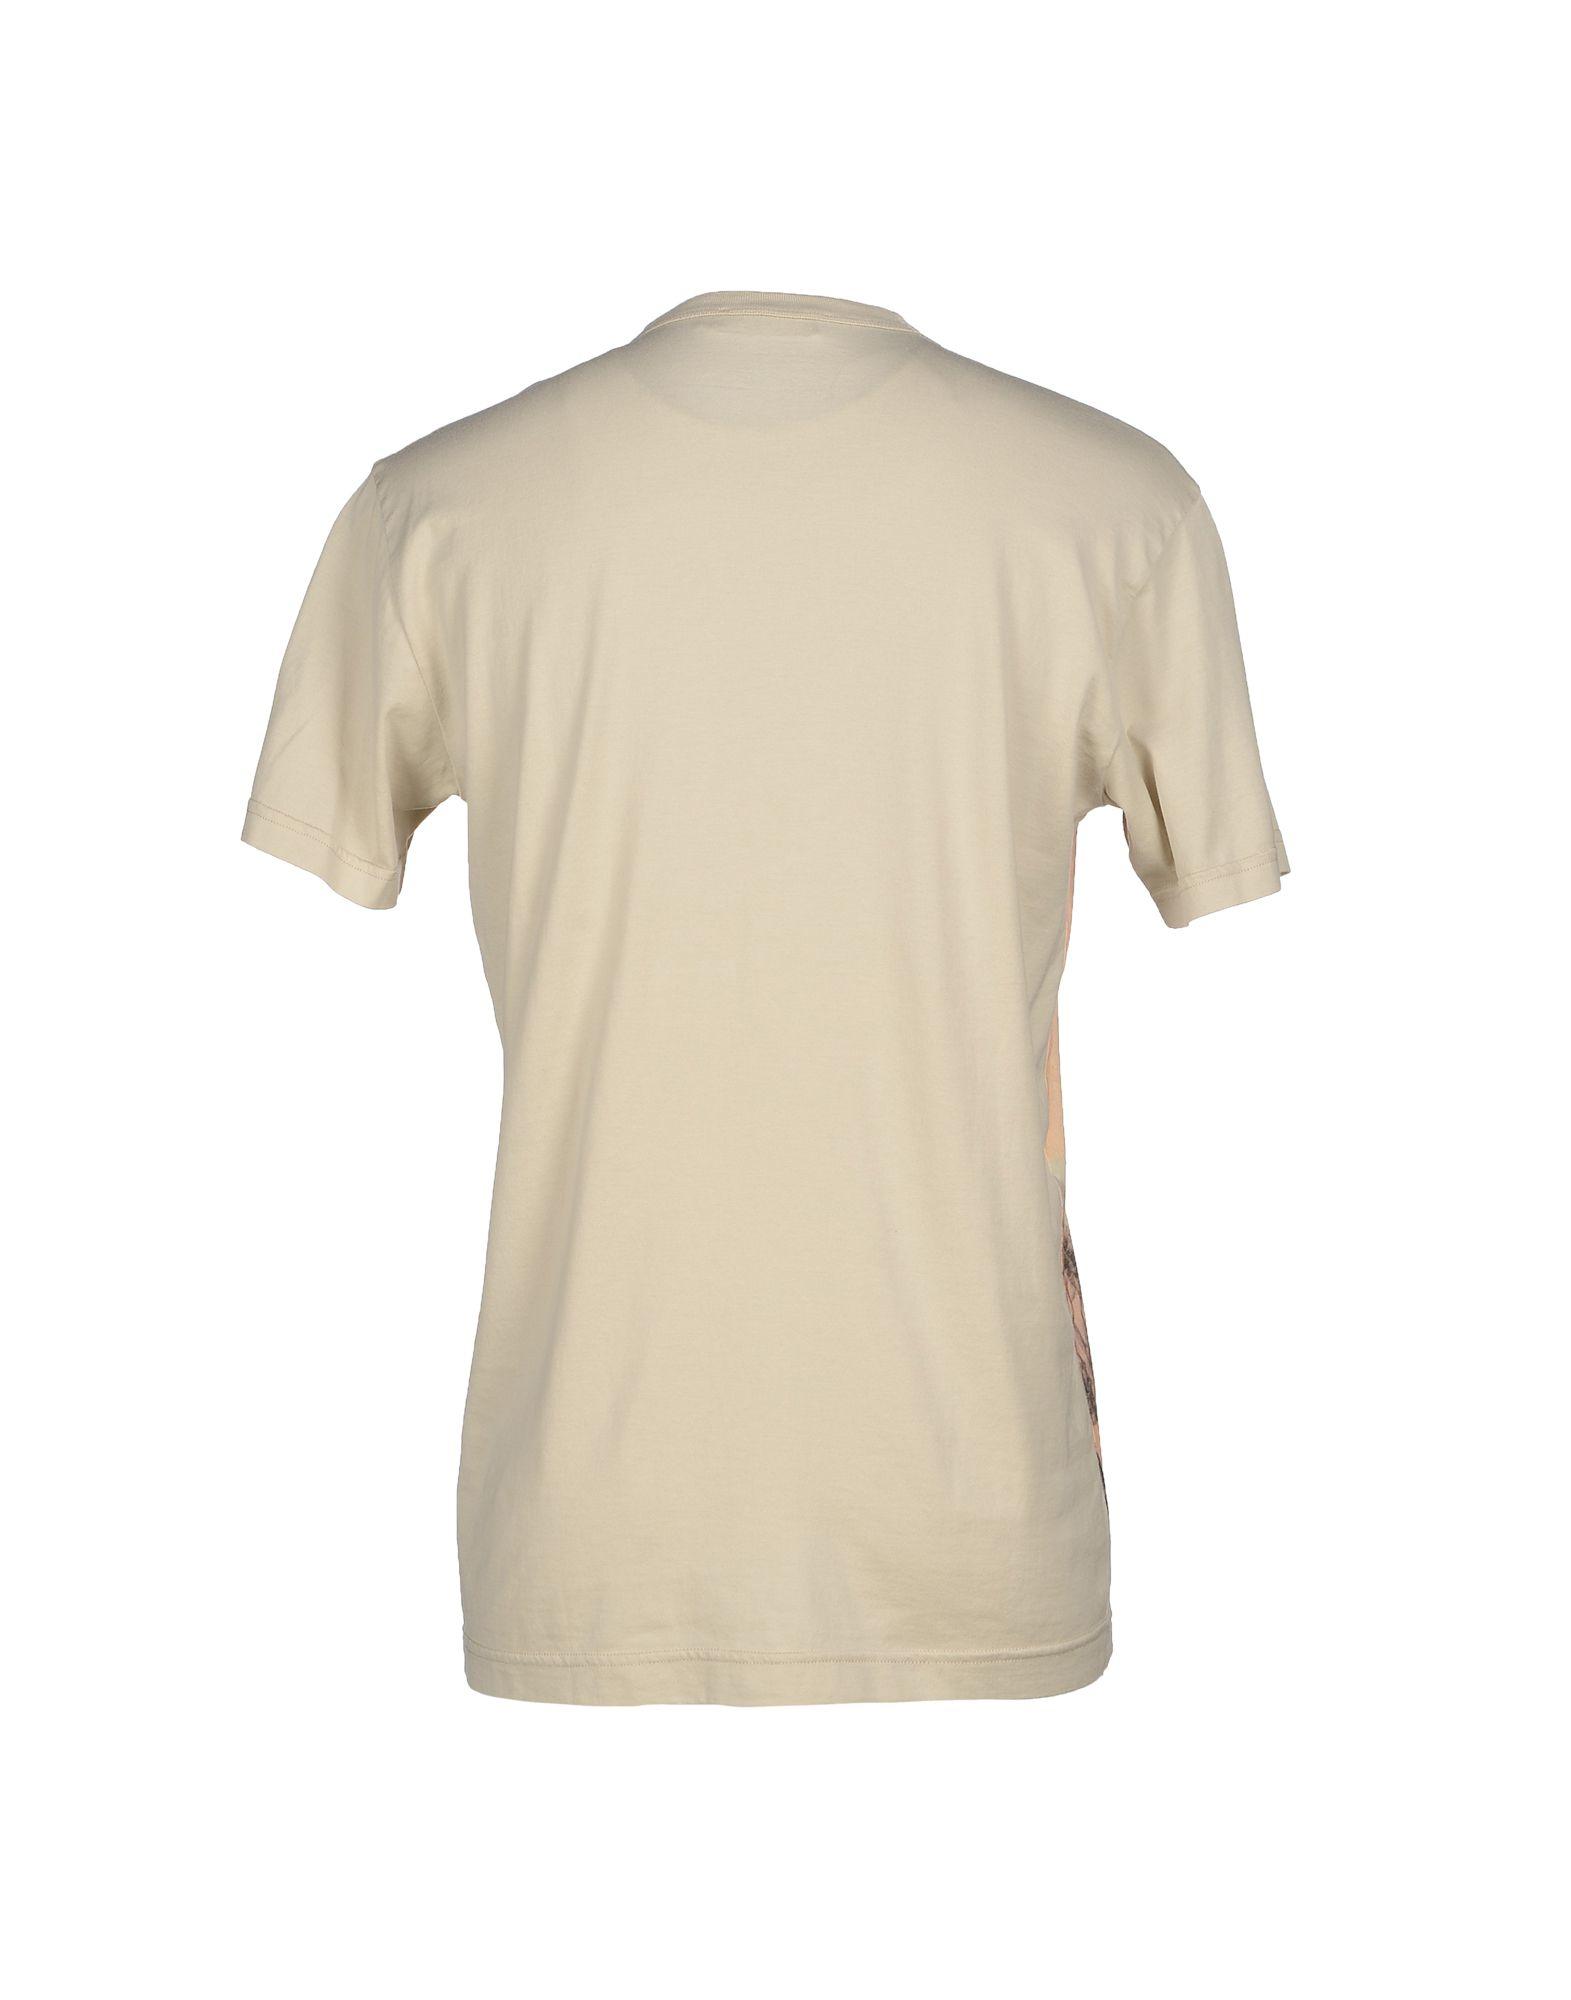 lyst dolce gabbana t shirt in white for men. Black Bedroom Furniture Sets. Home Design Ideas